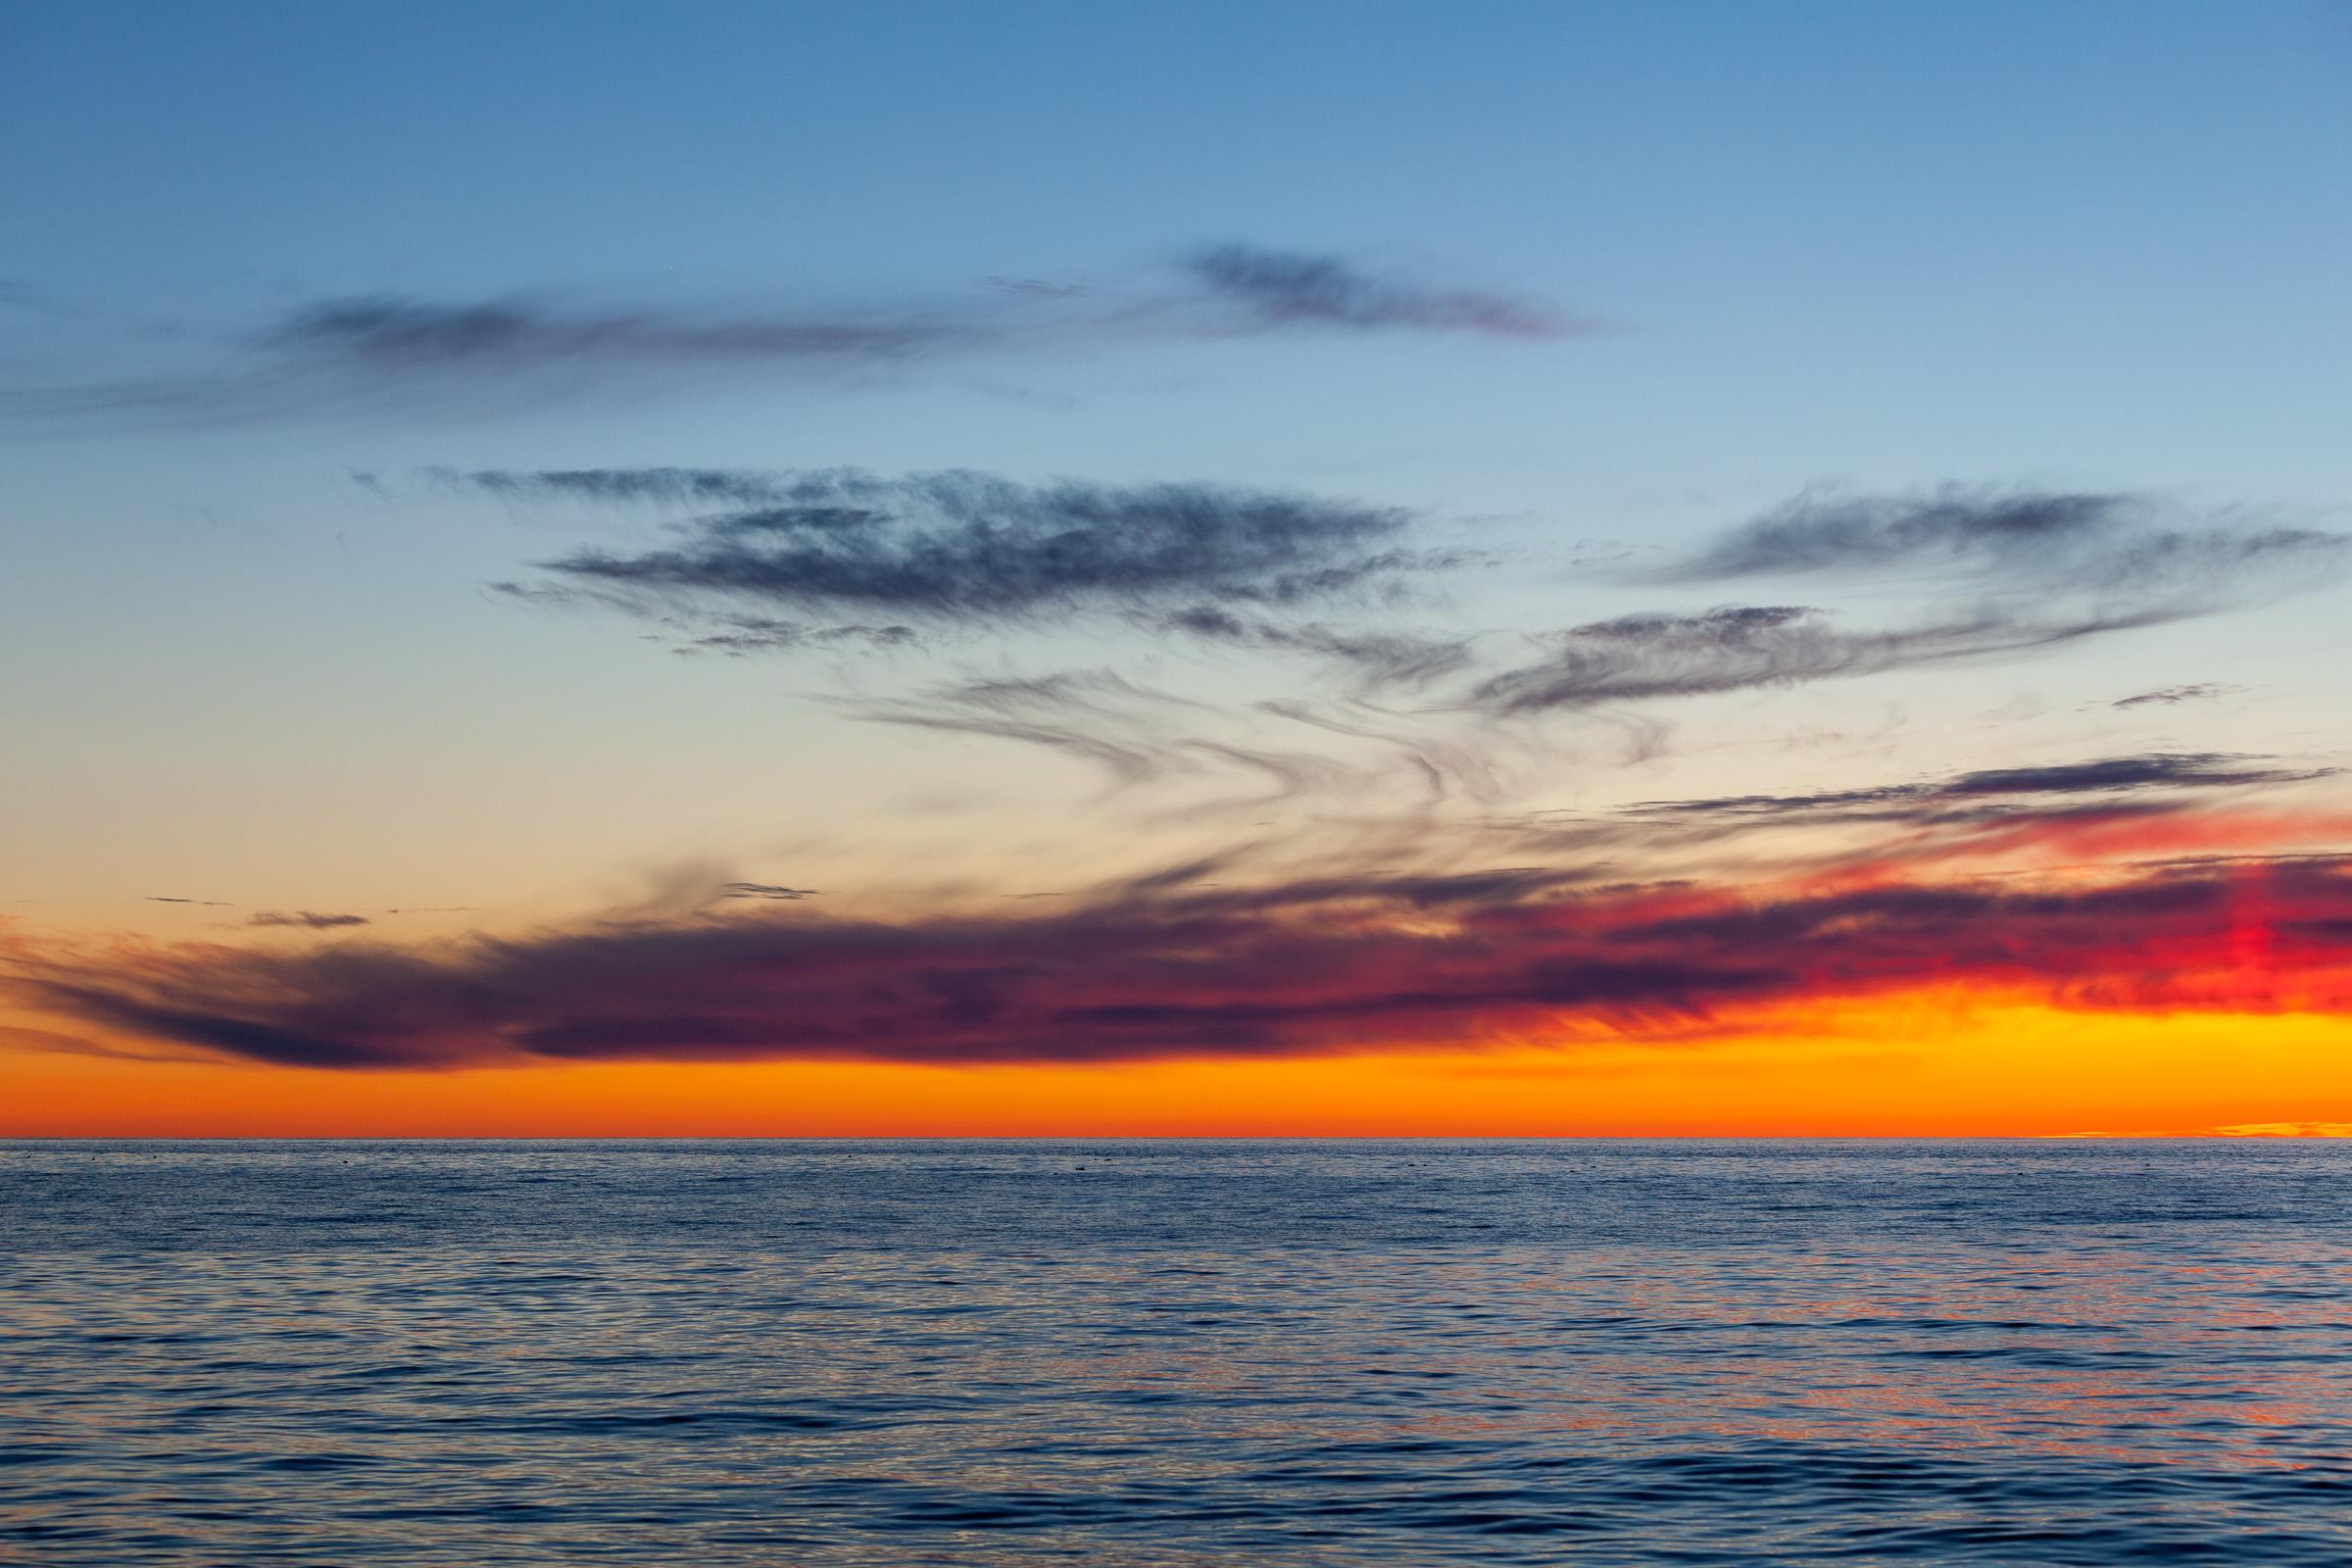 Vivid sunset, Cape Breton Island, Canada